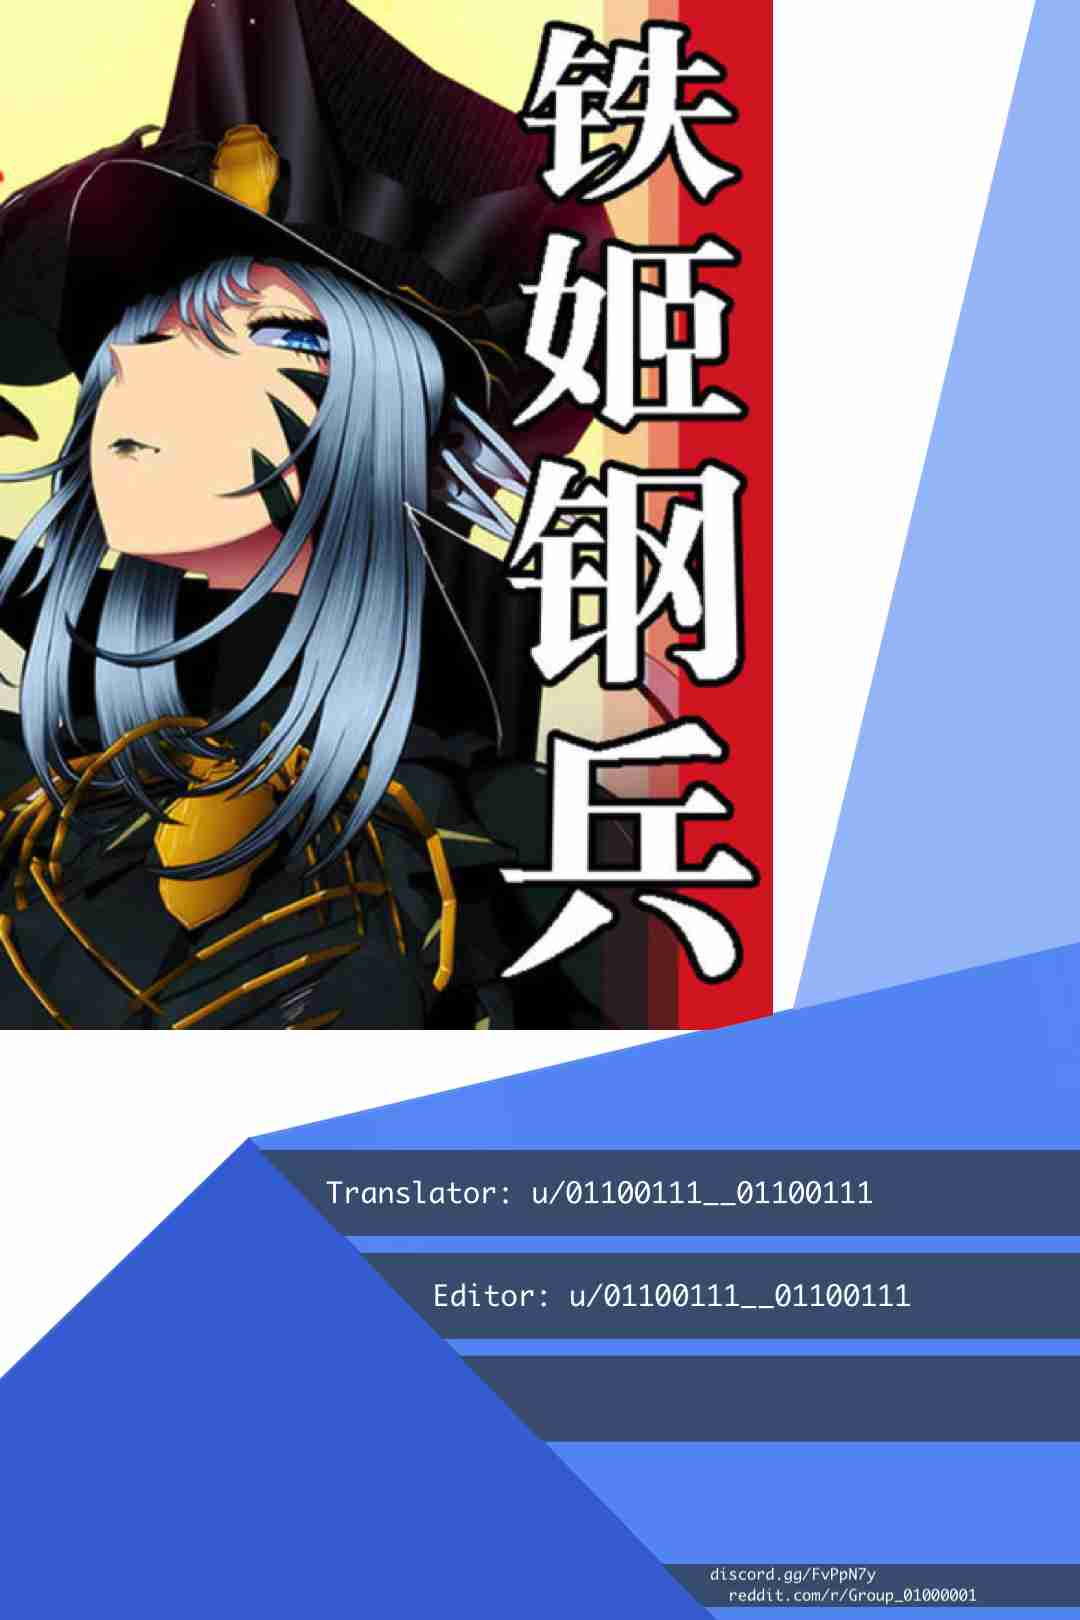 https://manga.mangadogs.com/comics/pic2/59/24443/731167/a50d6d536bc495e21188adddad4e853a.jpg Page 1